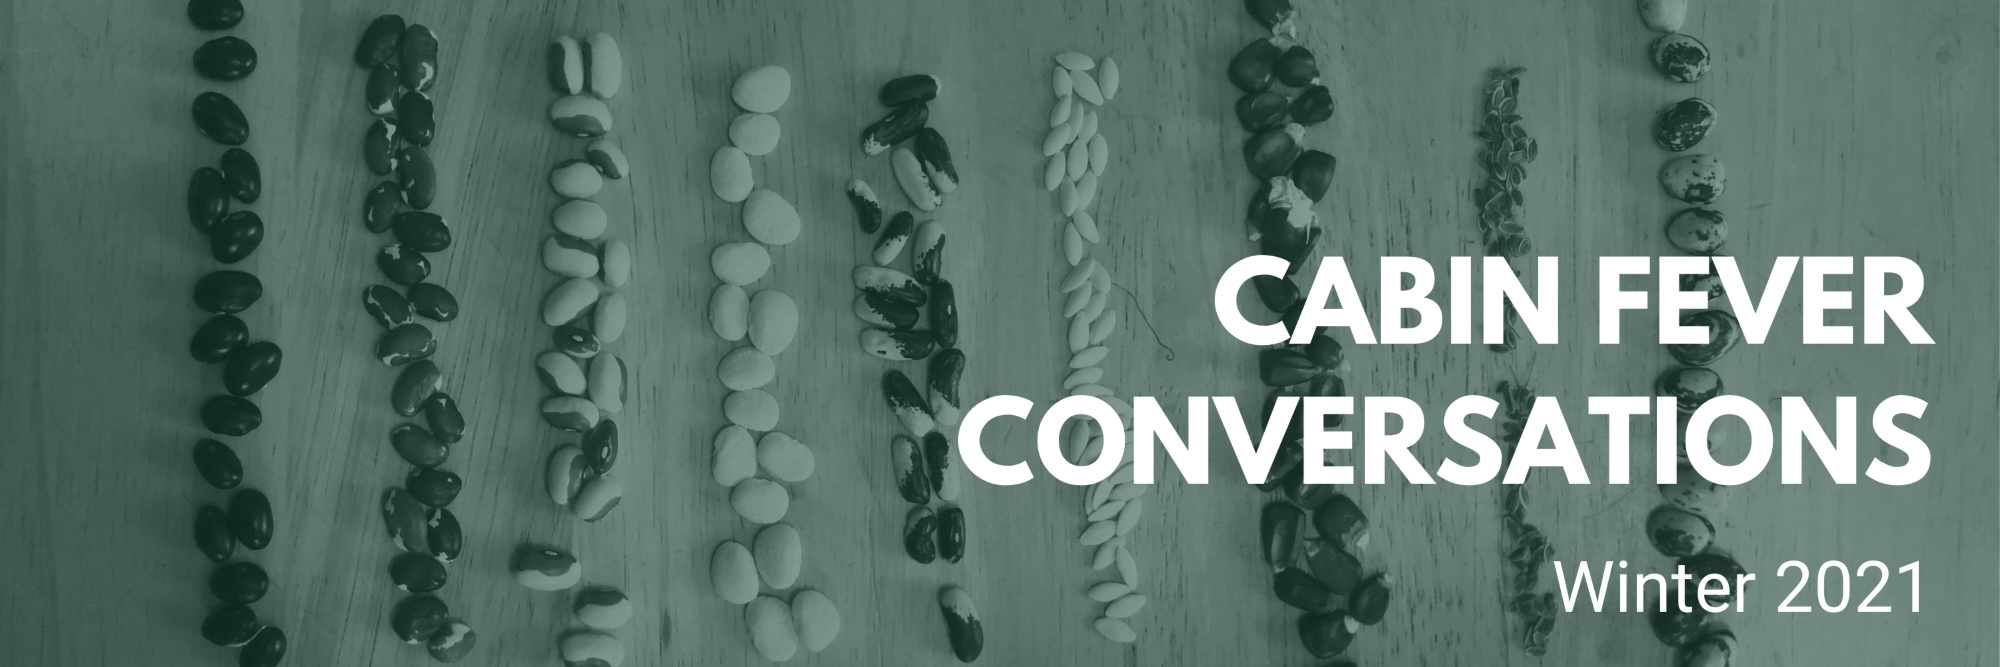 Cabin Fever Conversations Winter 2021